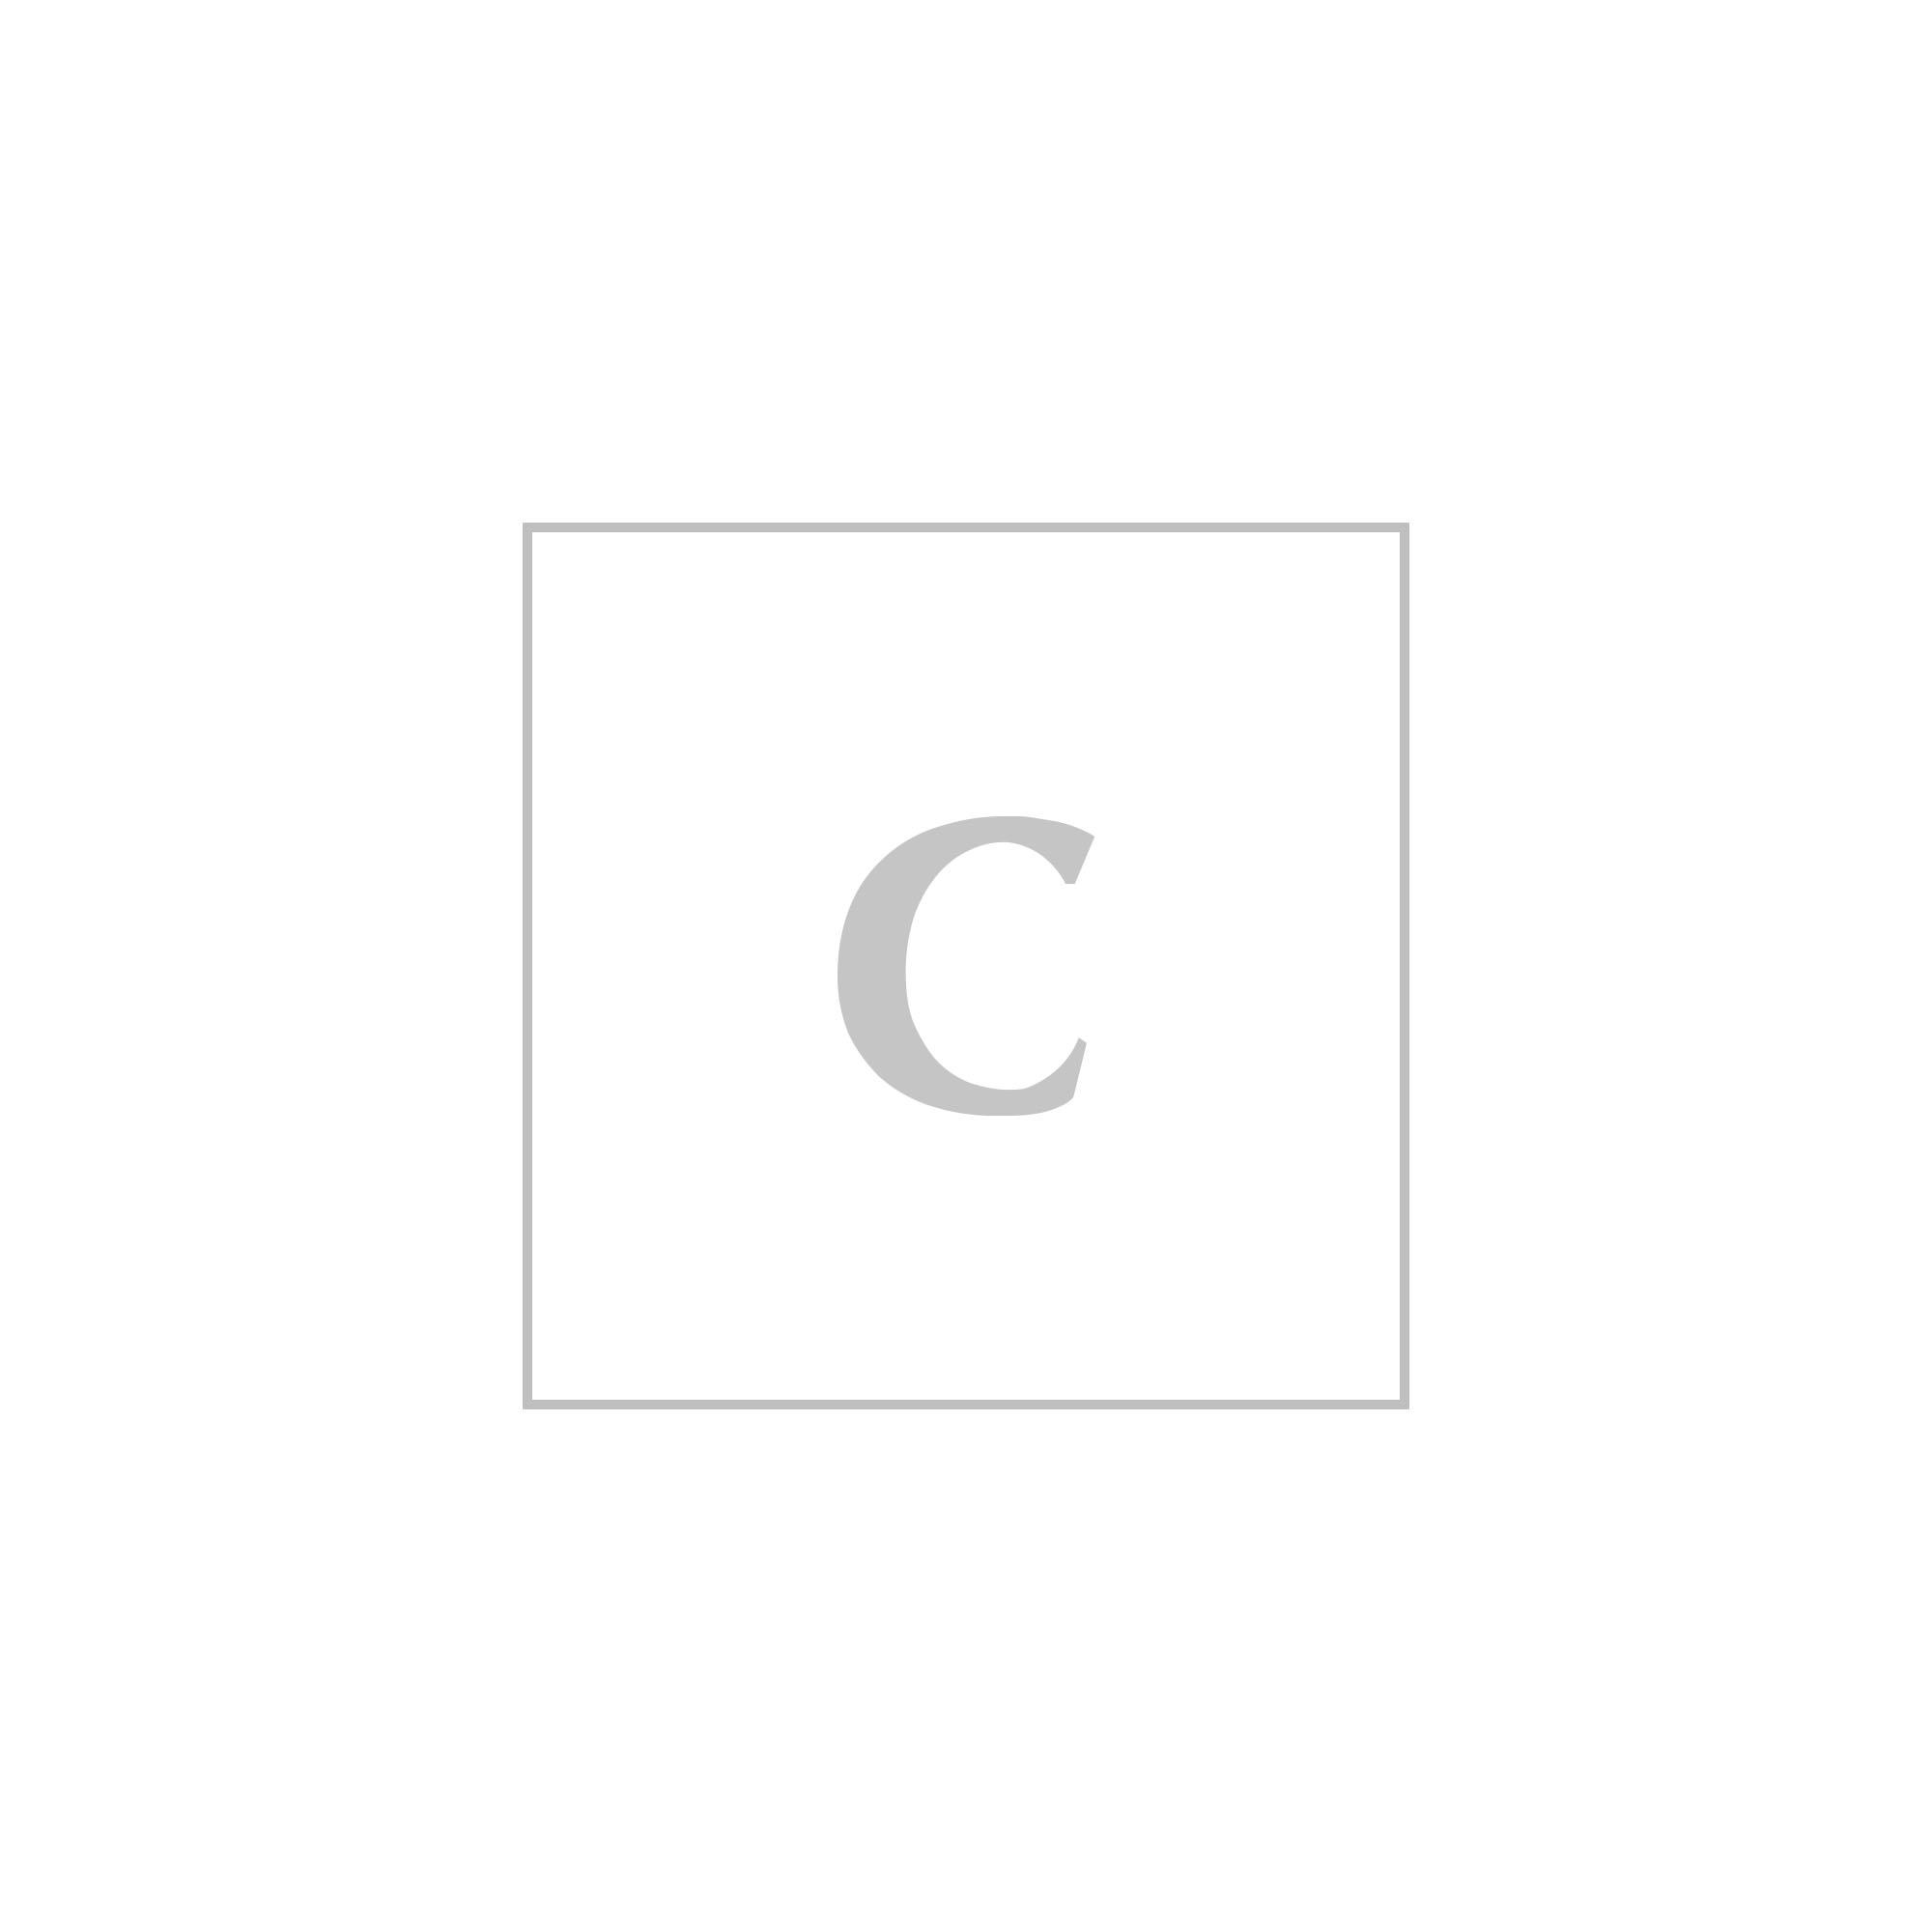 1a3c1e4cc25 T-shirts And Polo Shirts 1017 Alyx 9sm for Women Grey Camo